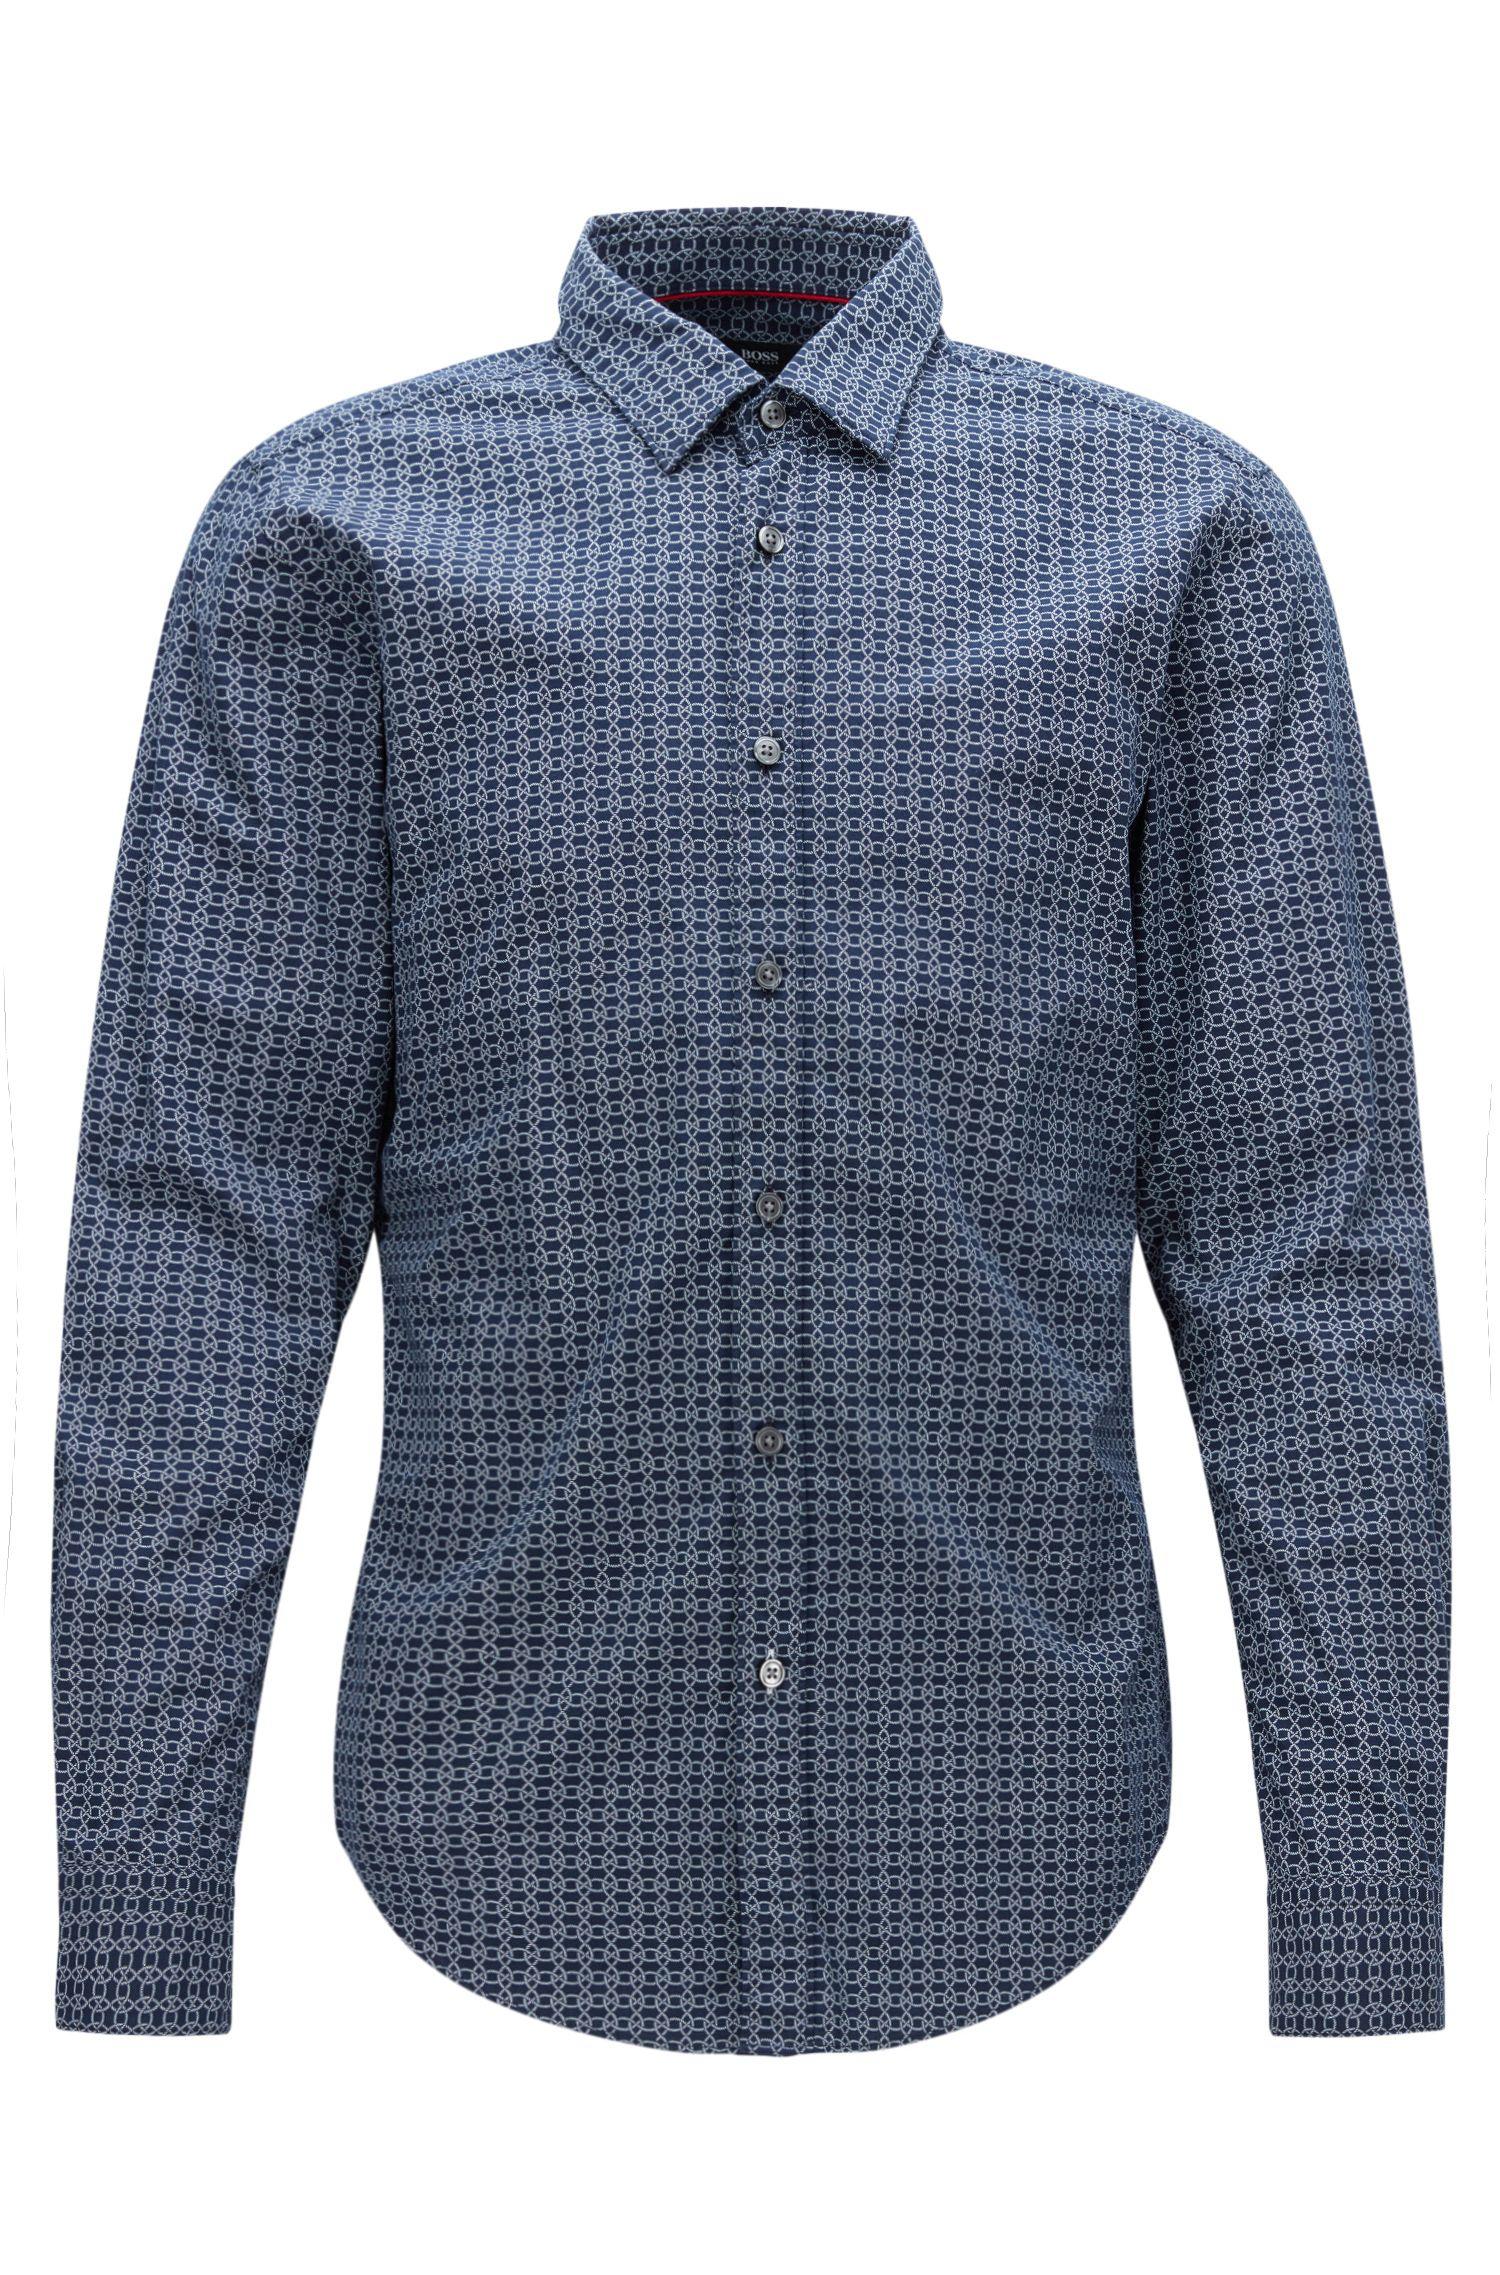 Nautical Cotton Button Down Shirt, Slim Fit | Ronni